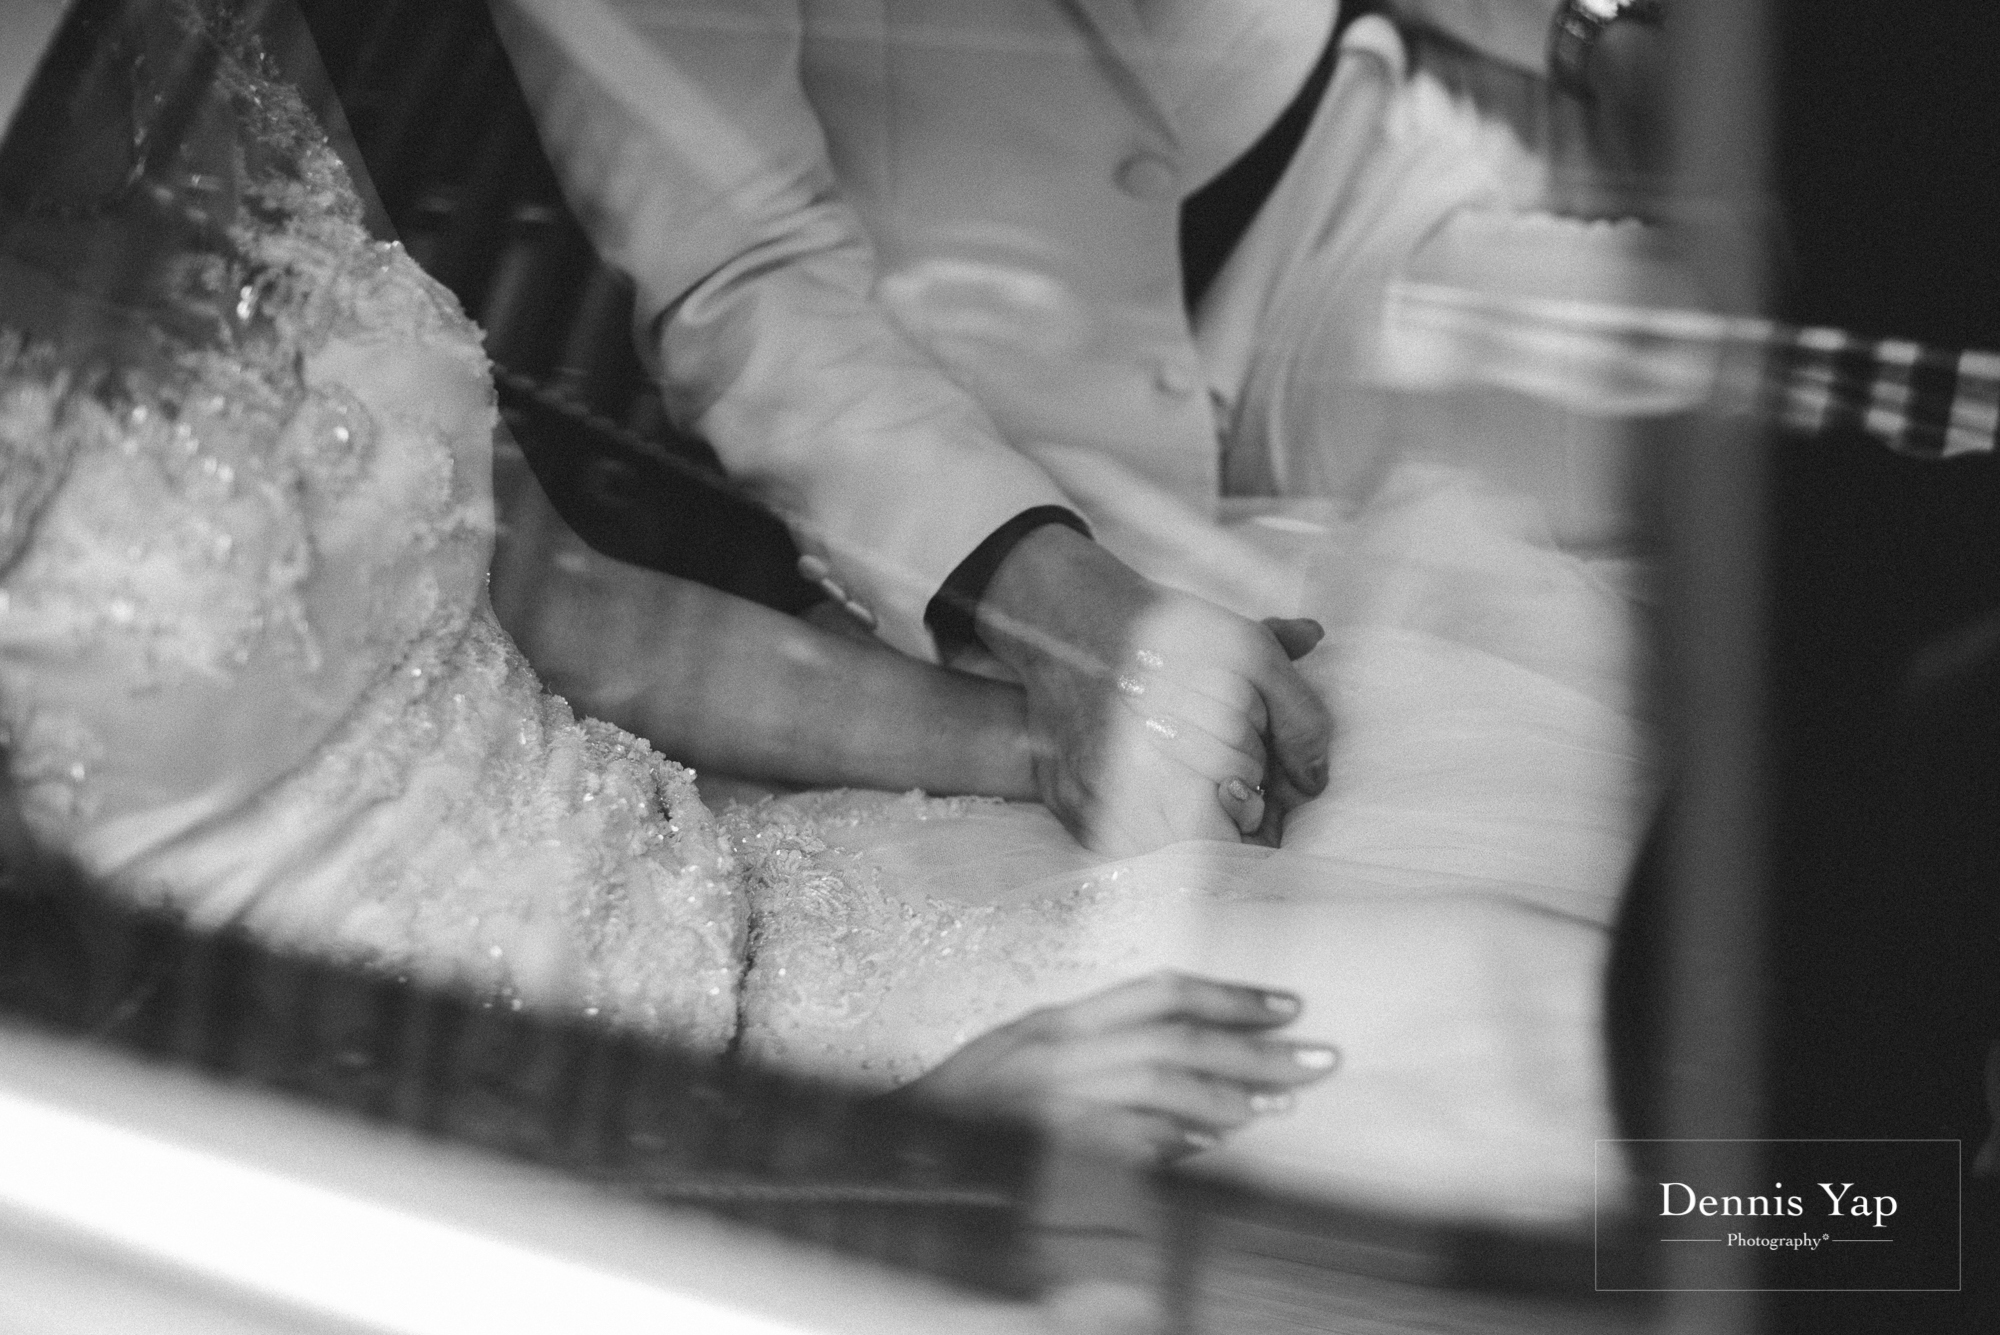 alex shir ley wedding day gate crash subang jaya usj dennis yap photography moments-15.jpg